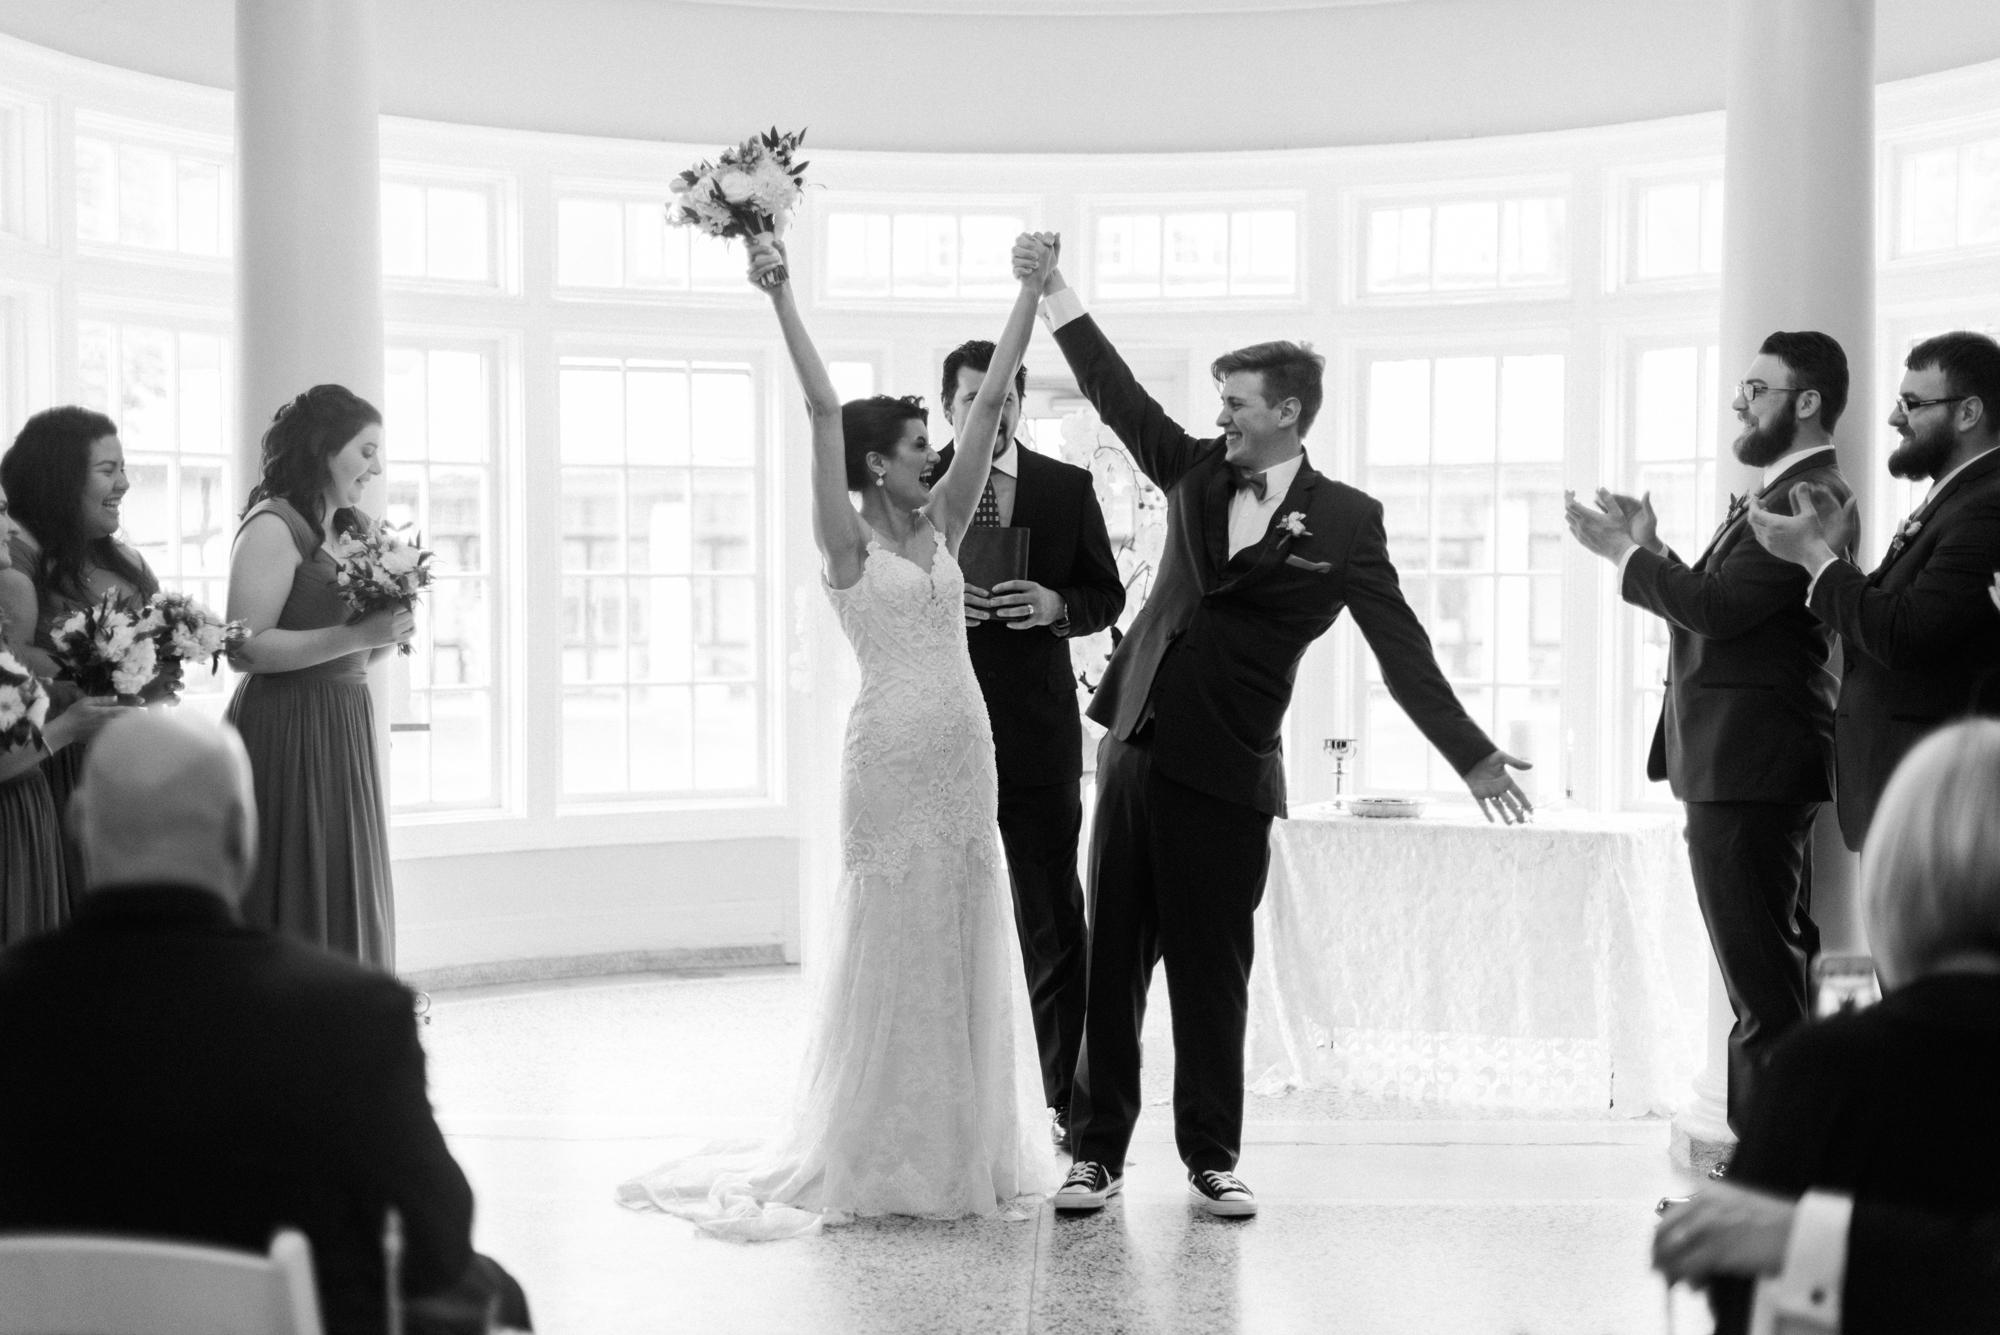 saratoga-springs-new-york-national-museum-of-dance-film-wedding-photographer-45.jpg